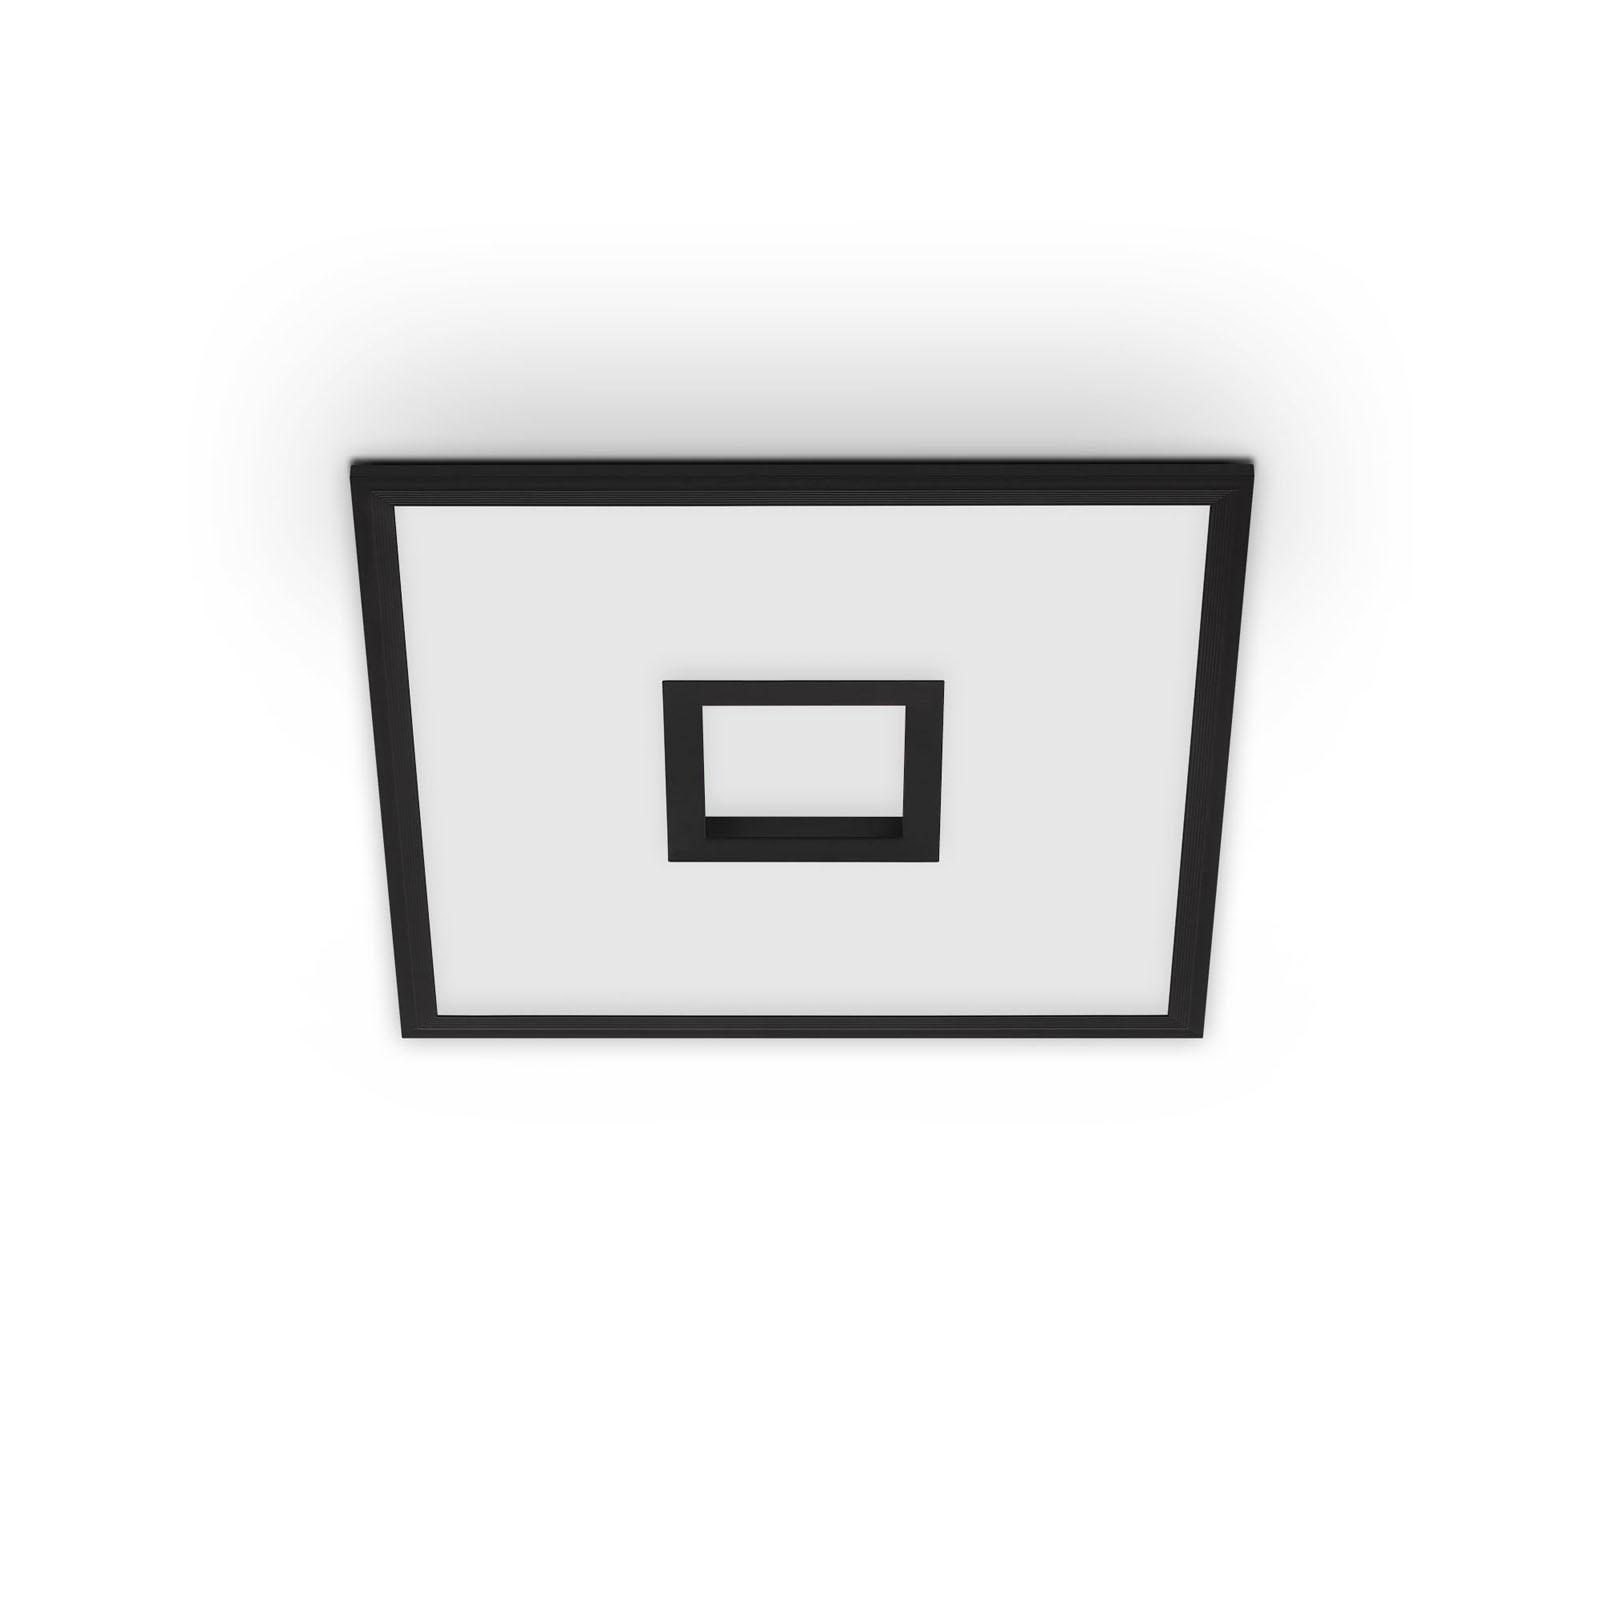 TELEFUNKEN CCT LED Panel, 44,5 cm, 24 W, Schwarz